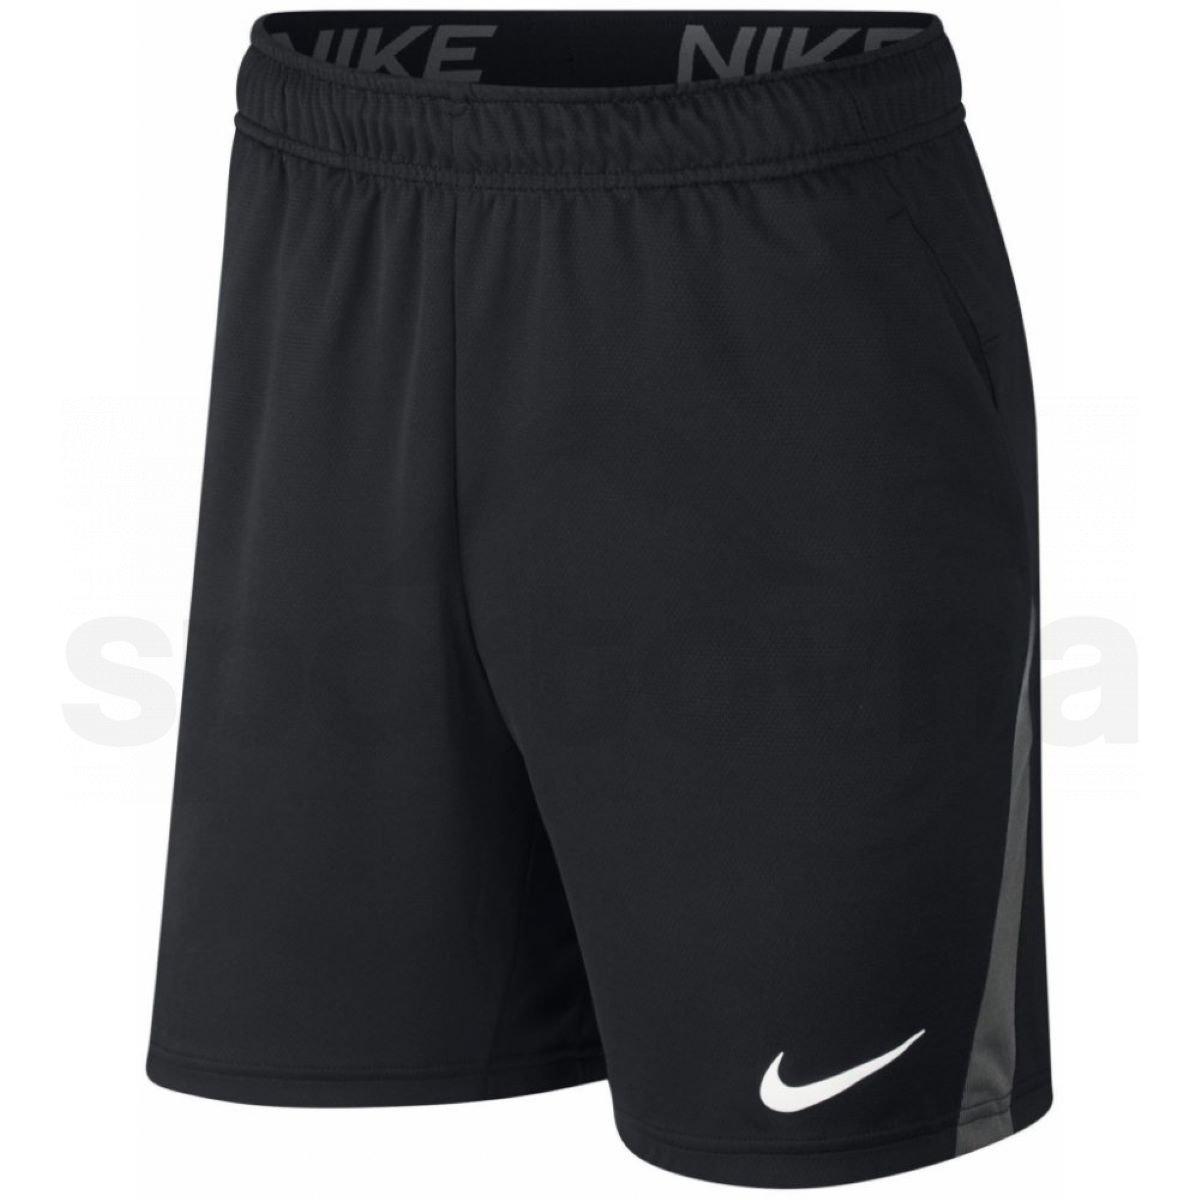 Nike dry short 5.0 CJ2007-010 černá 1